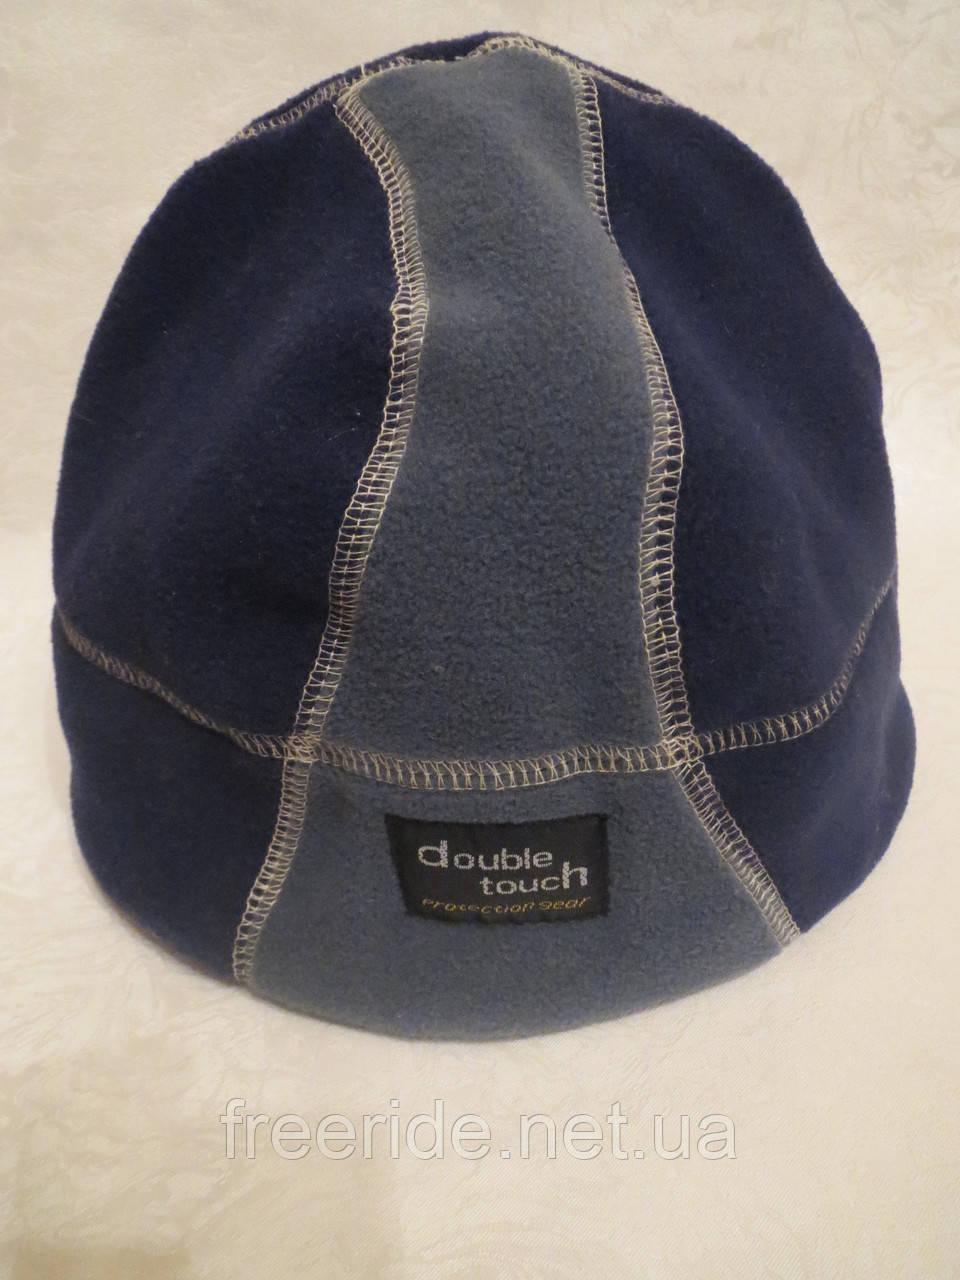 Мужская флисовая шапка Double Touch (55-57)